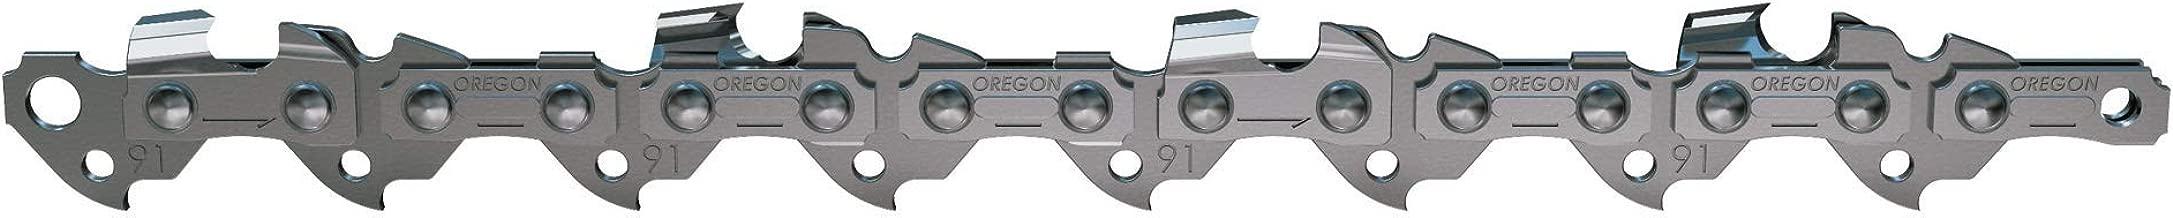 Oregon 91PX052G 52 Drive Link Chamfer Chisel Xtra Guard 3/8-Inch Pitch Low Kickback Saw Chain